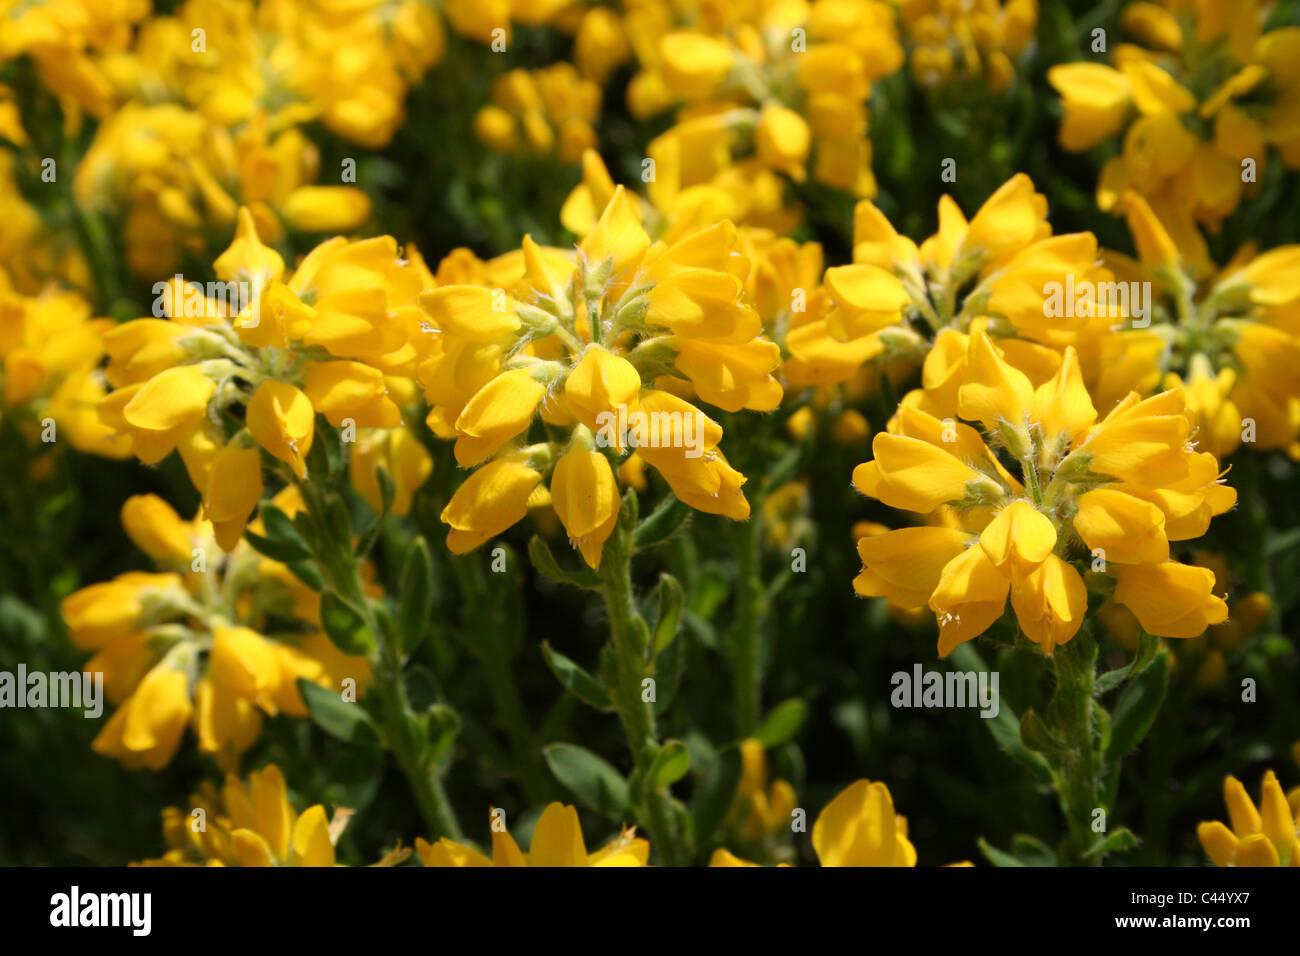 Yellow Flowers On A Garden Shrub - Stock Image